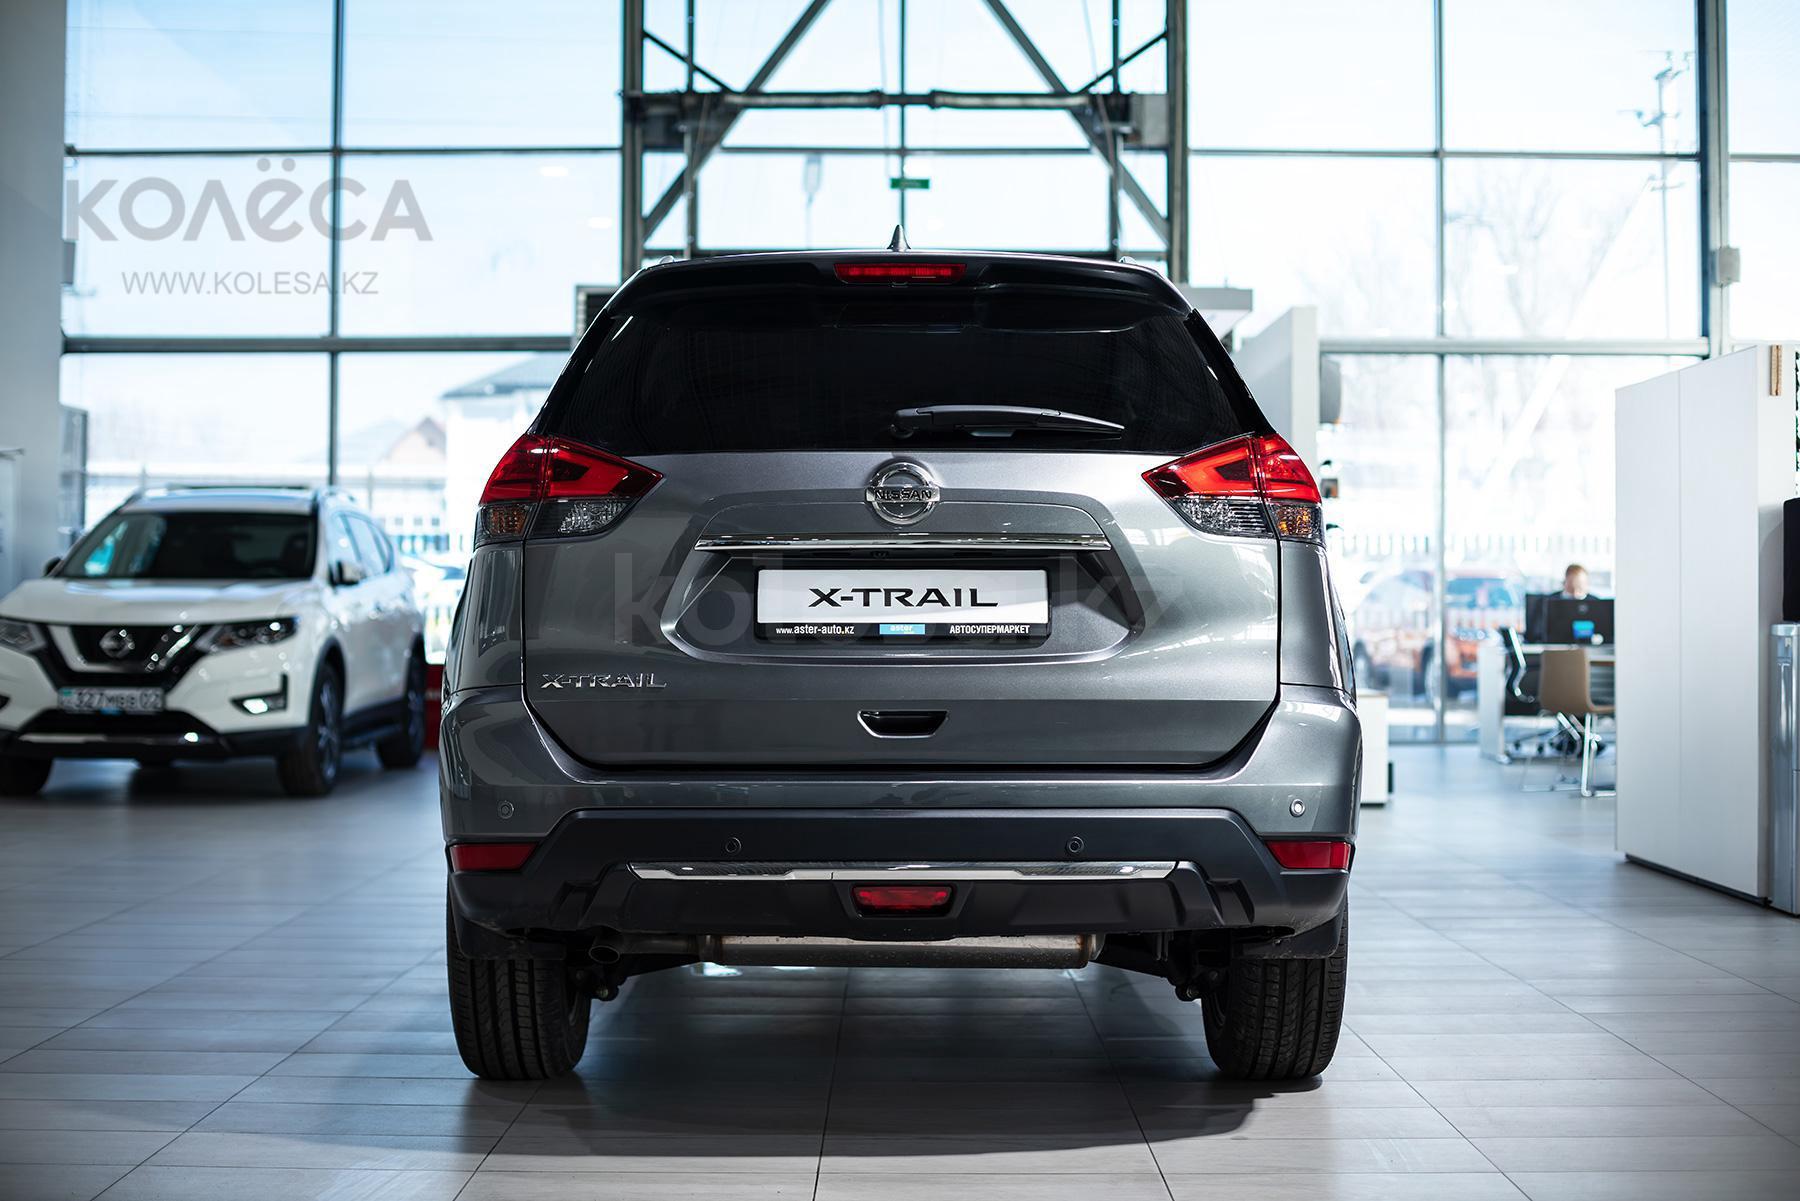 Nissan X-Trail J класса 2020-2021 года от 10 731 000 тенге